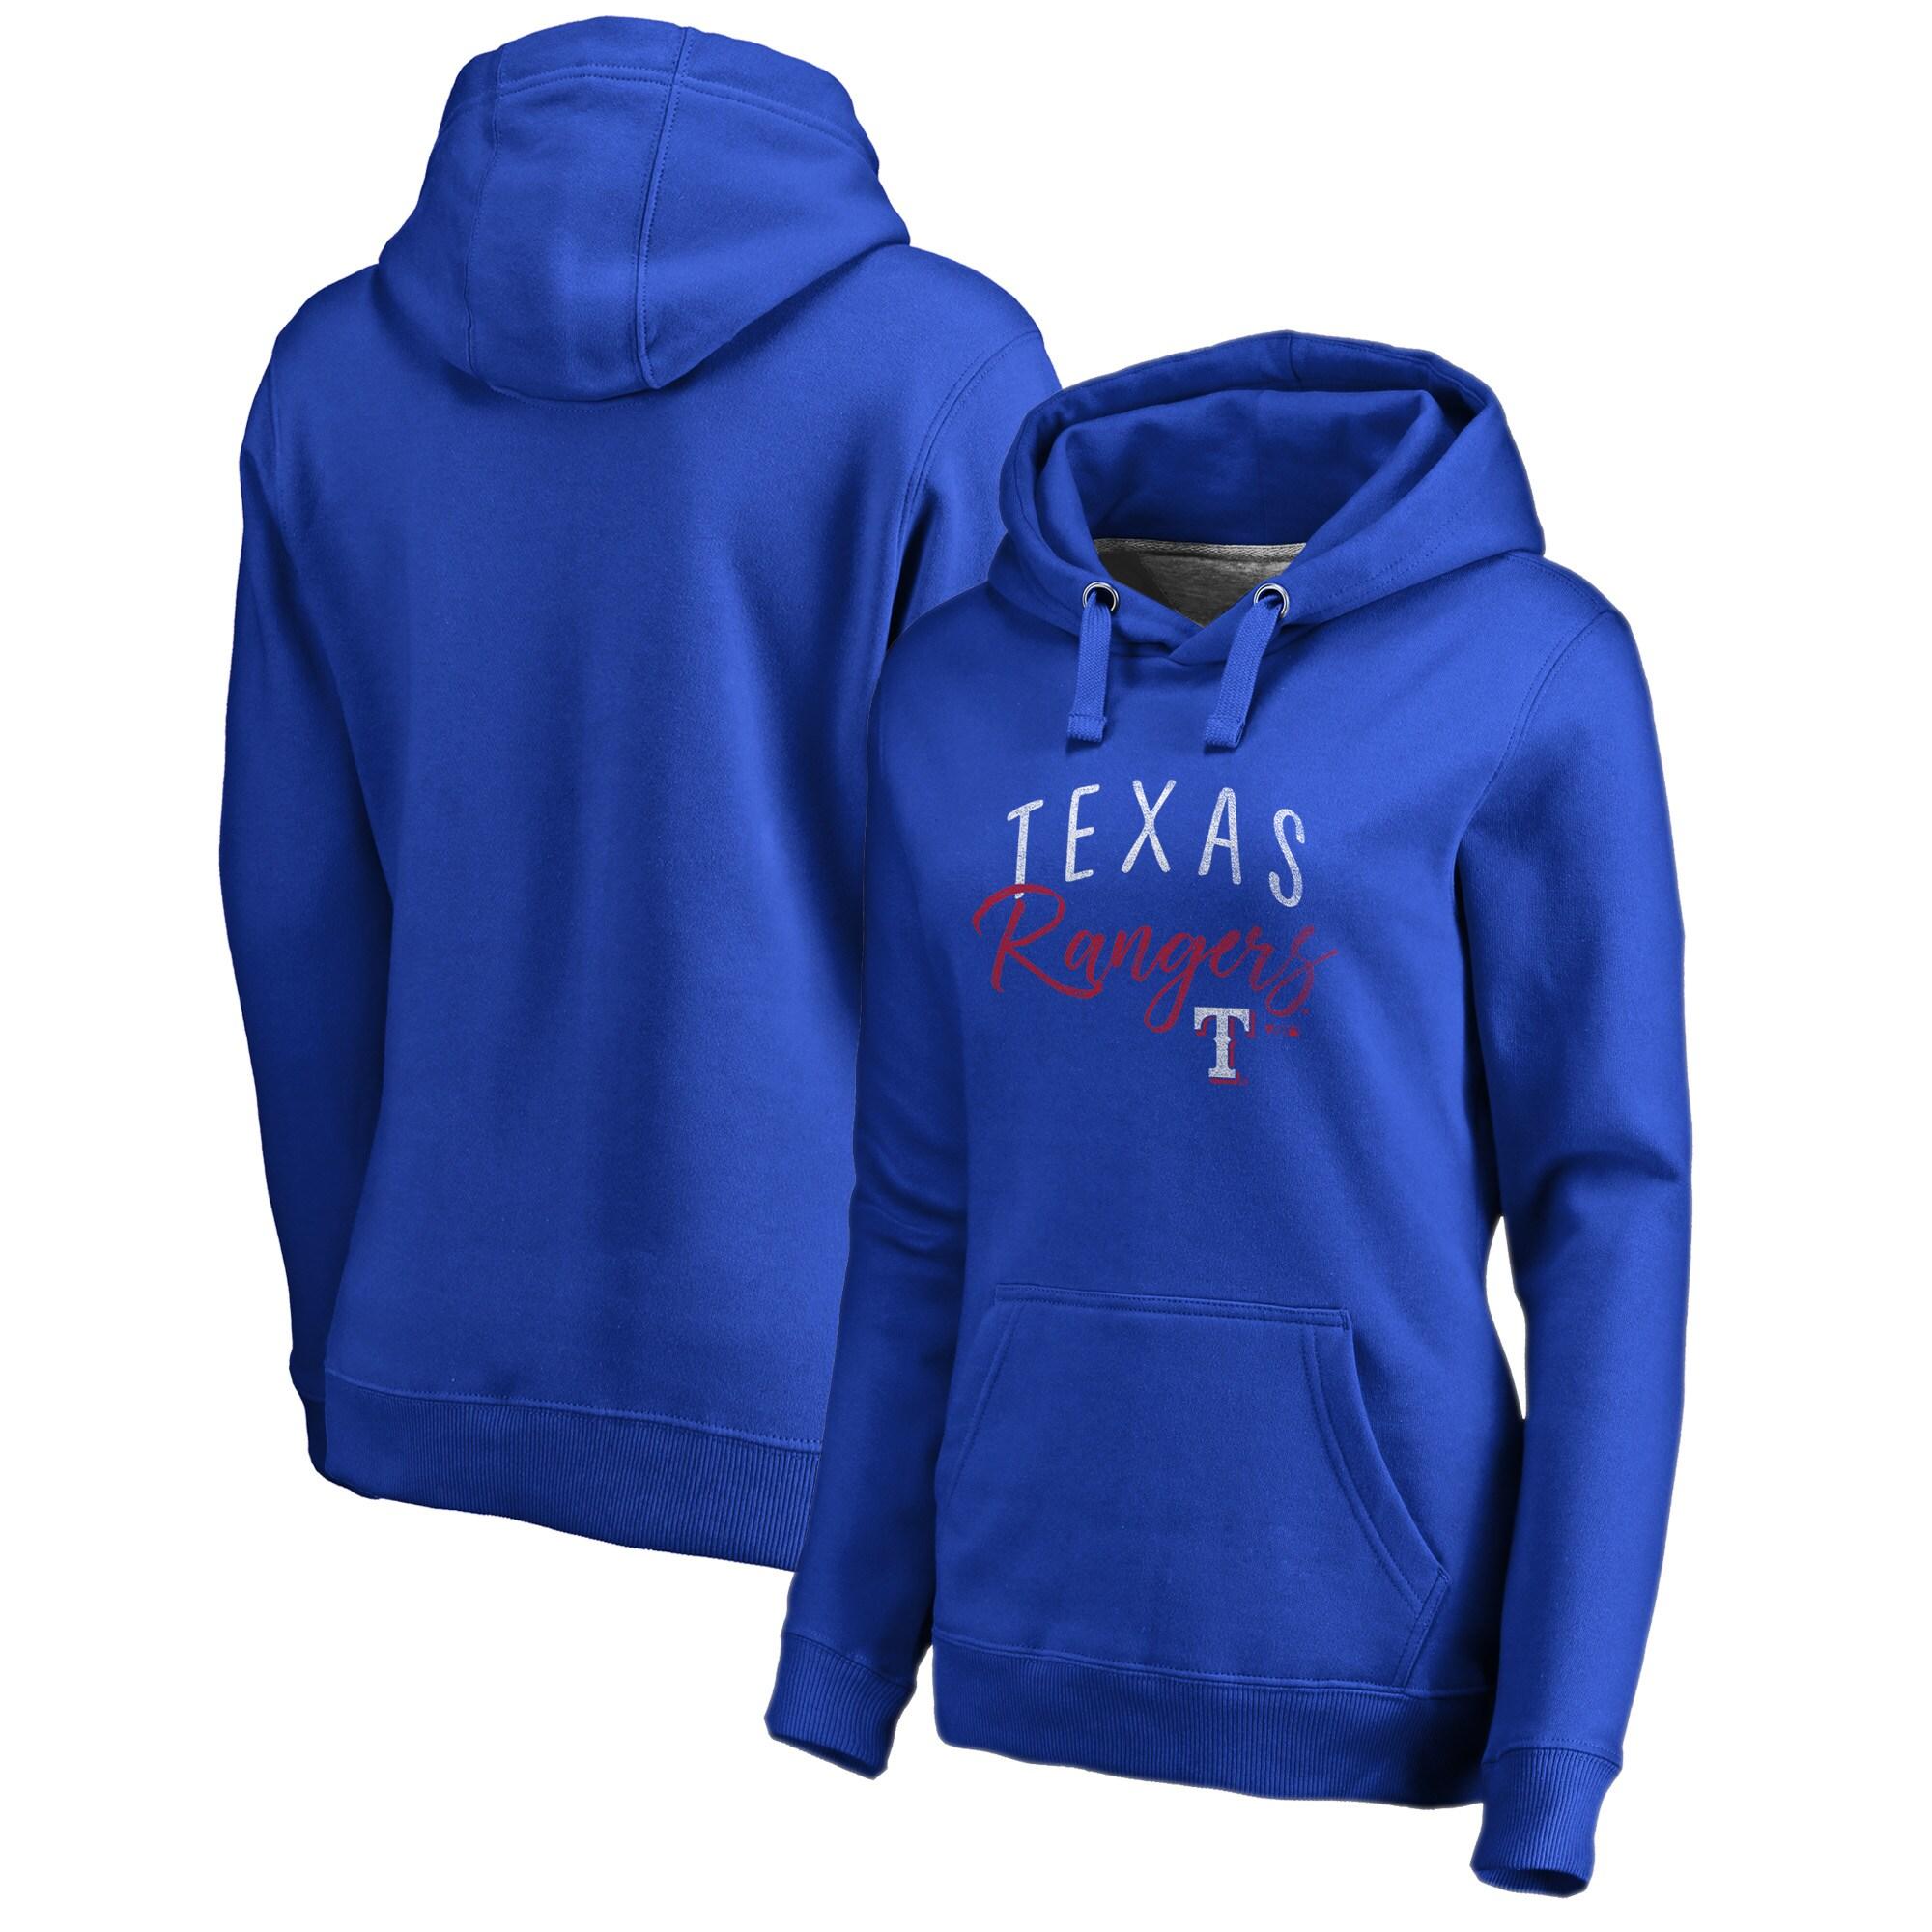 Texas Rangers Fanatics Branded Women's Graceful Pullover Hoodie - Royal